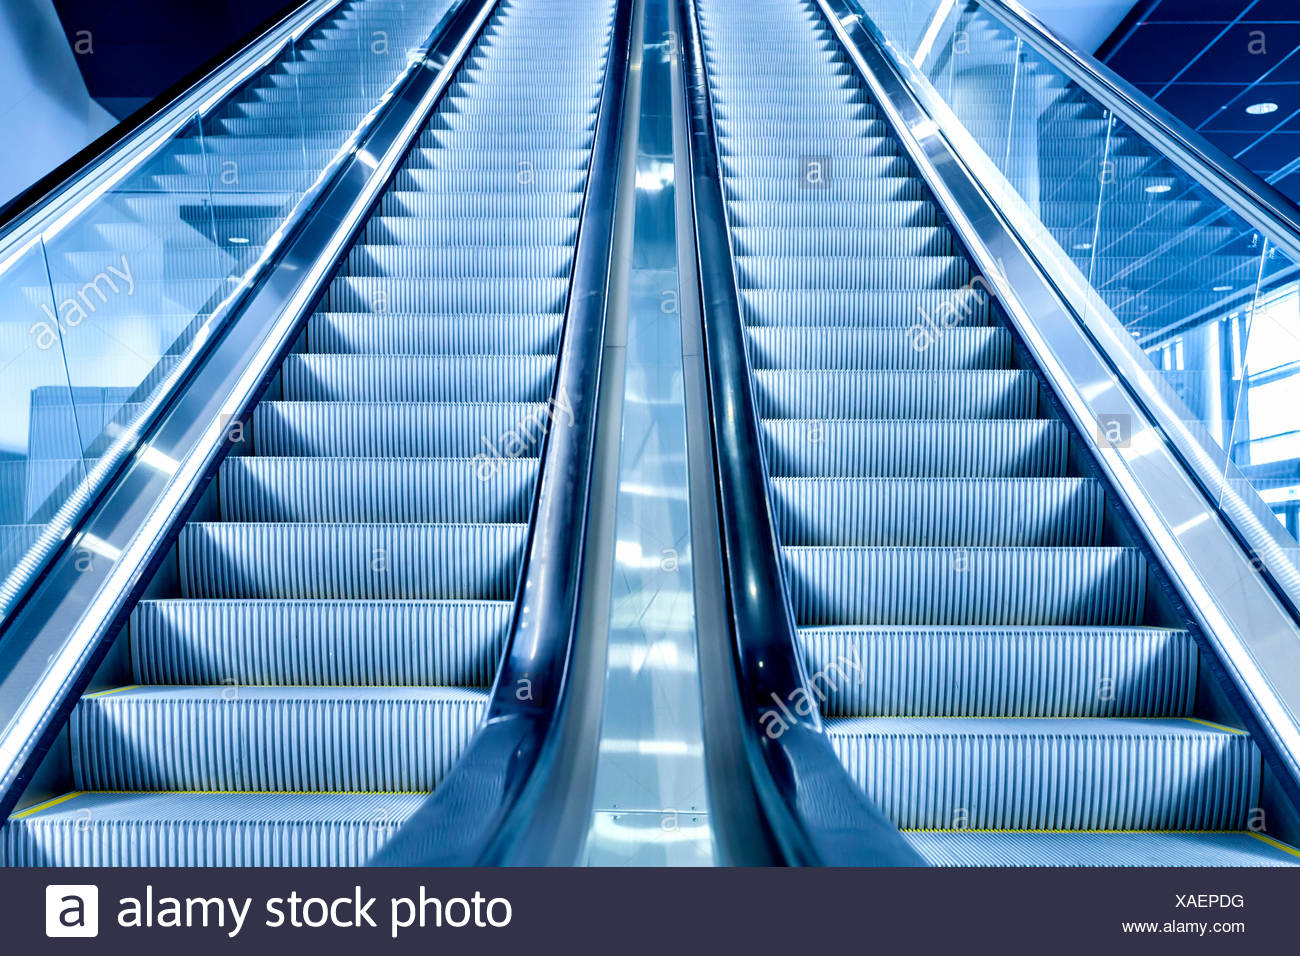 Escalator, Frankfurt am Main, Hesse, Germany - Stock Image